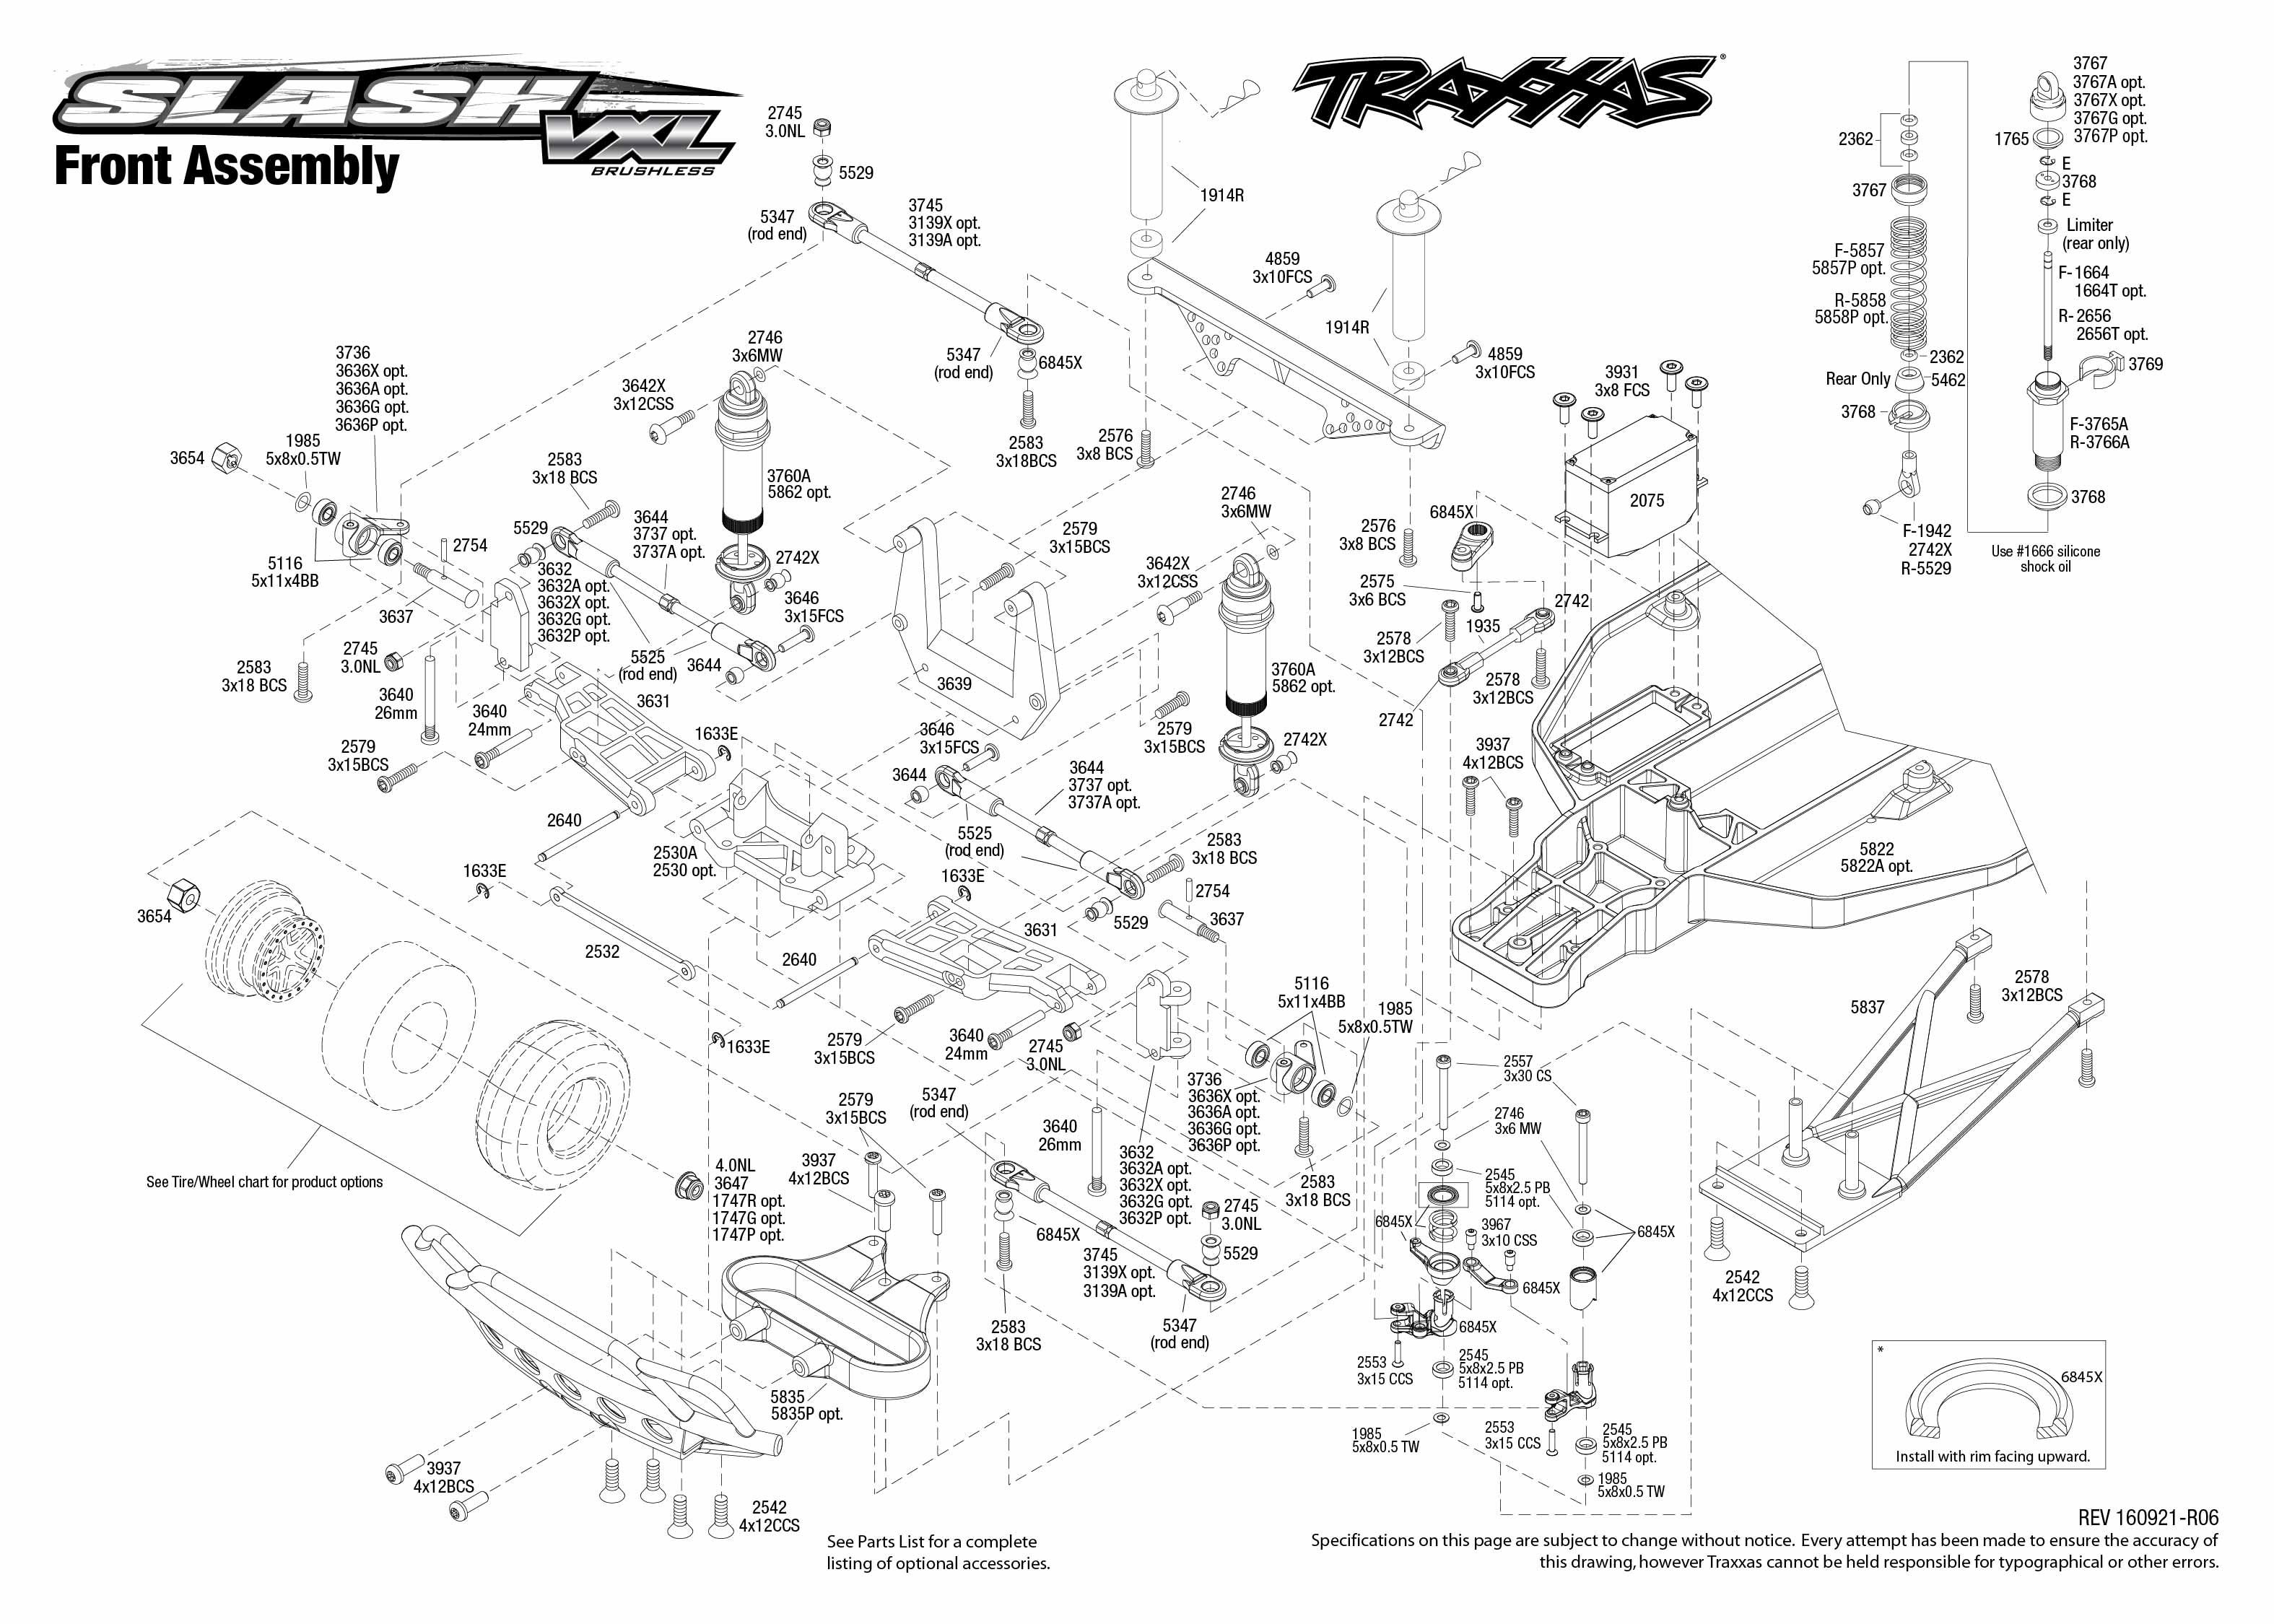 traxxas slash 2wd diagram wiring diagrams traxxas slash 2wd vxl manual traxxas slash 2wd diagram #4